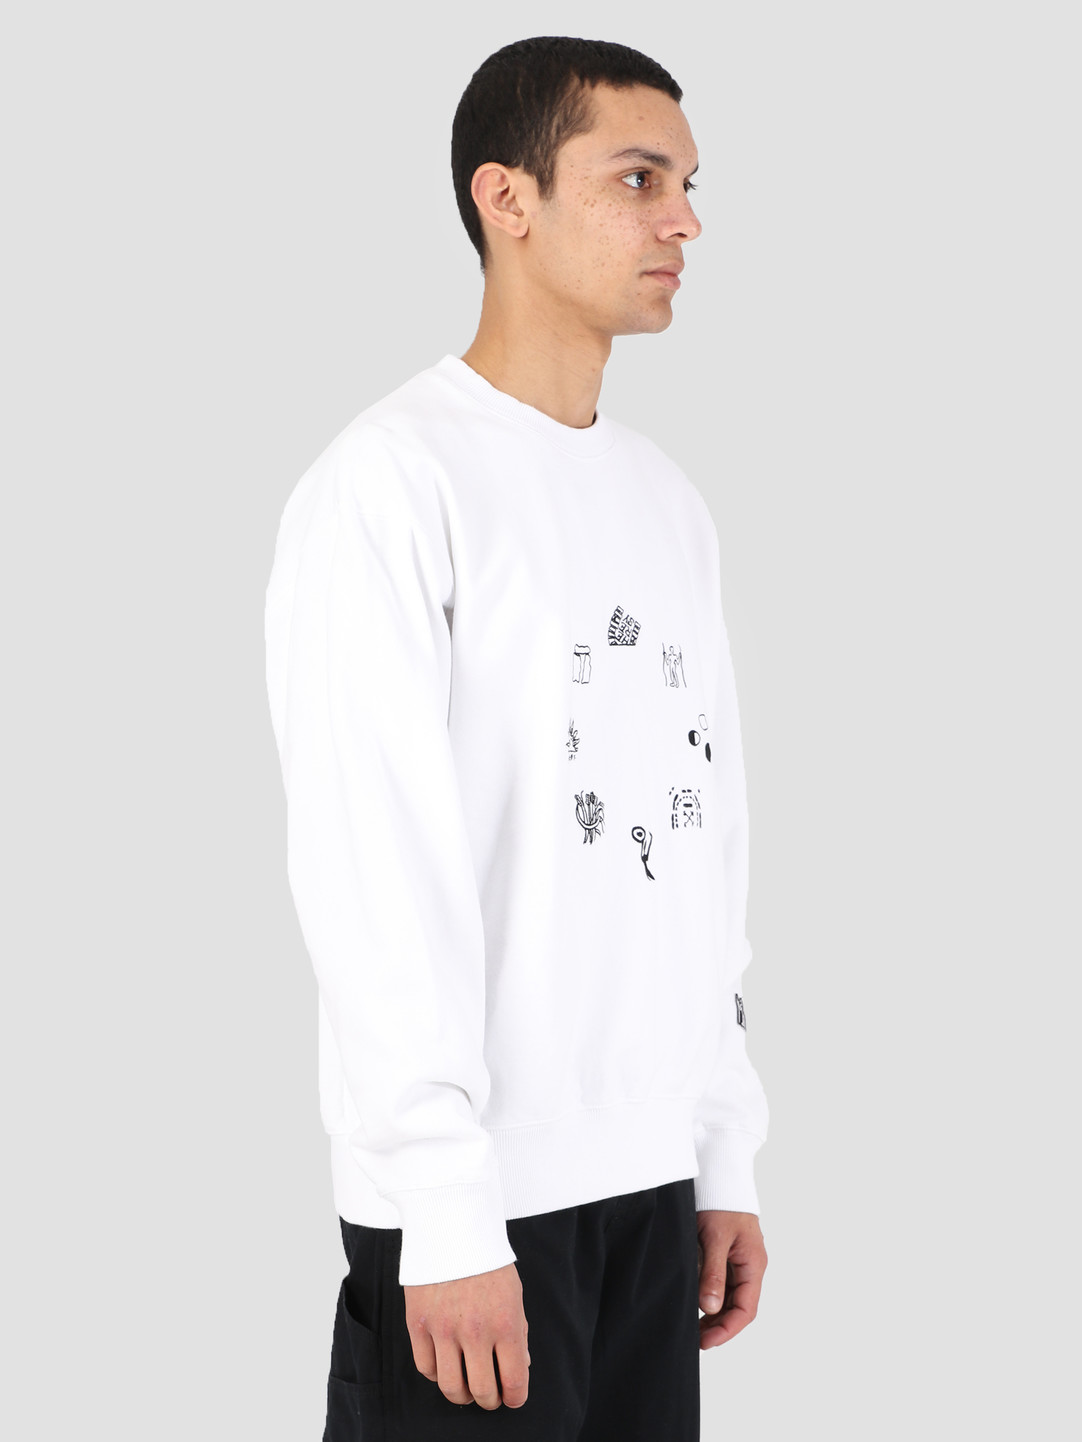 Heresy Heresy Emblem Sweater White HSS19-S03